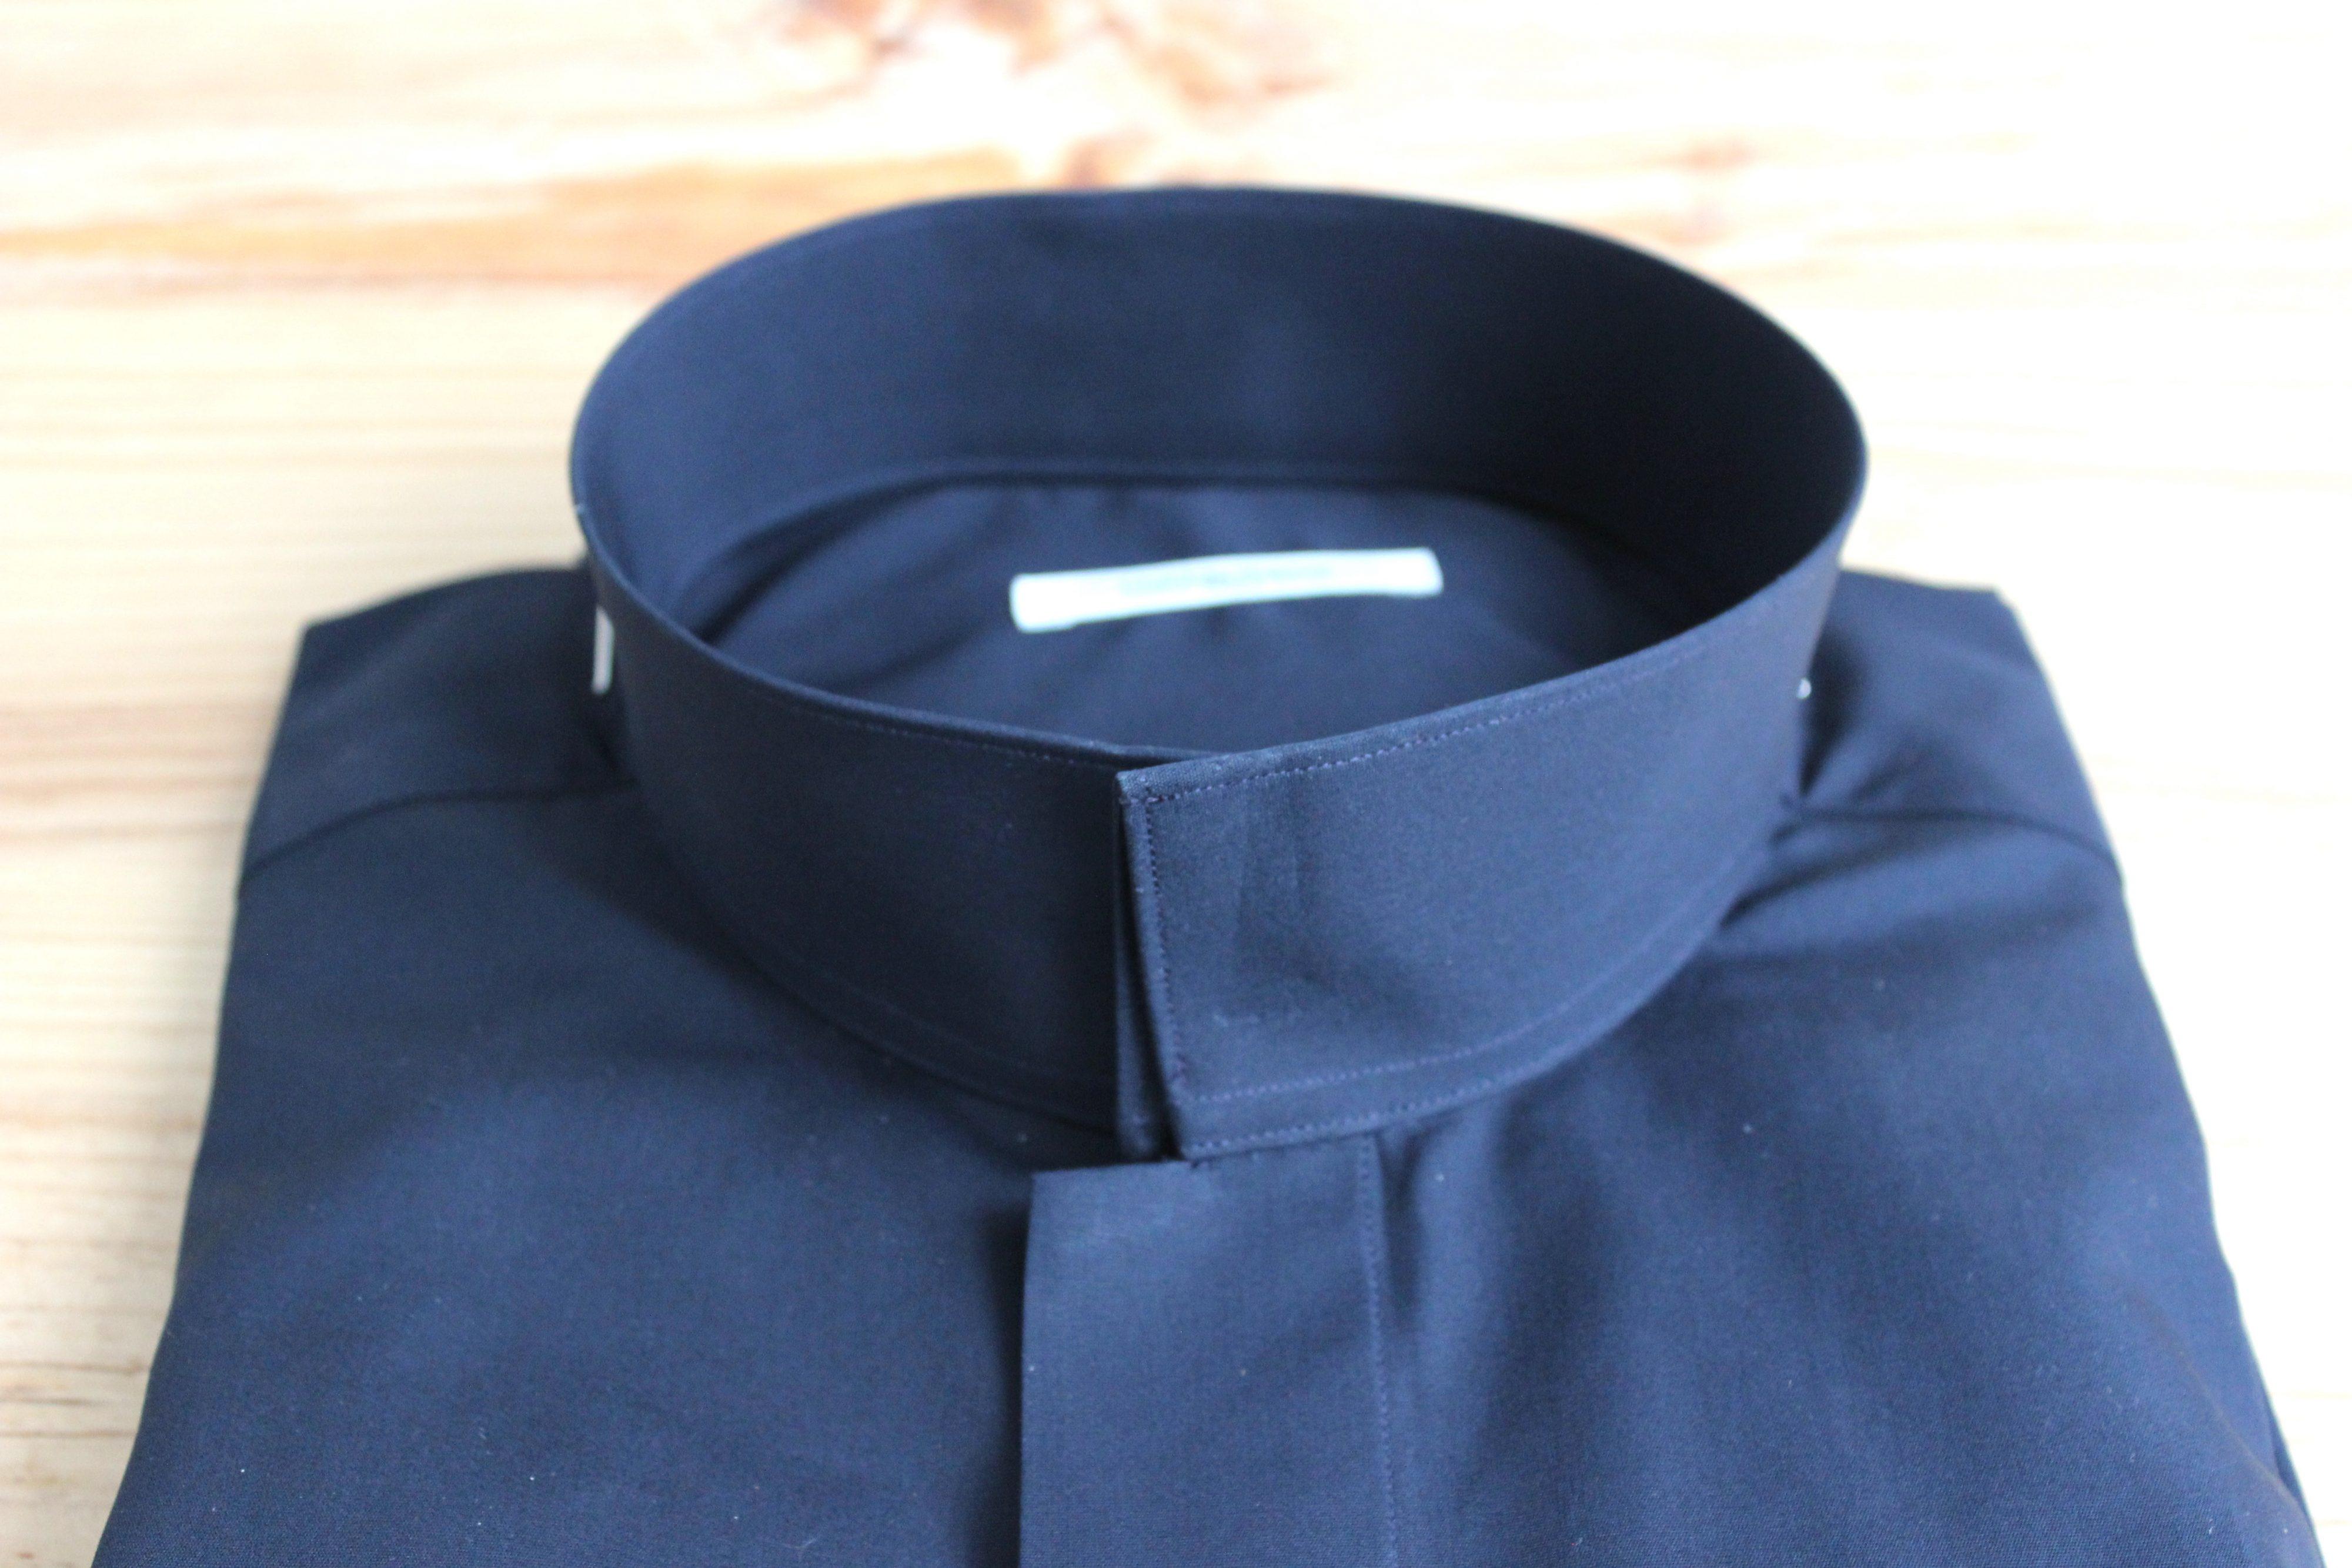 chemise cintrée homme , chemise cintrée , chemise sur mesure